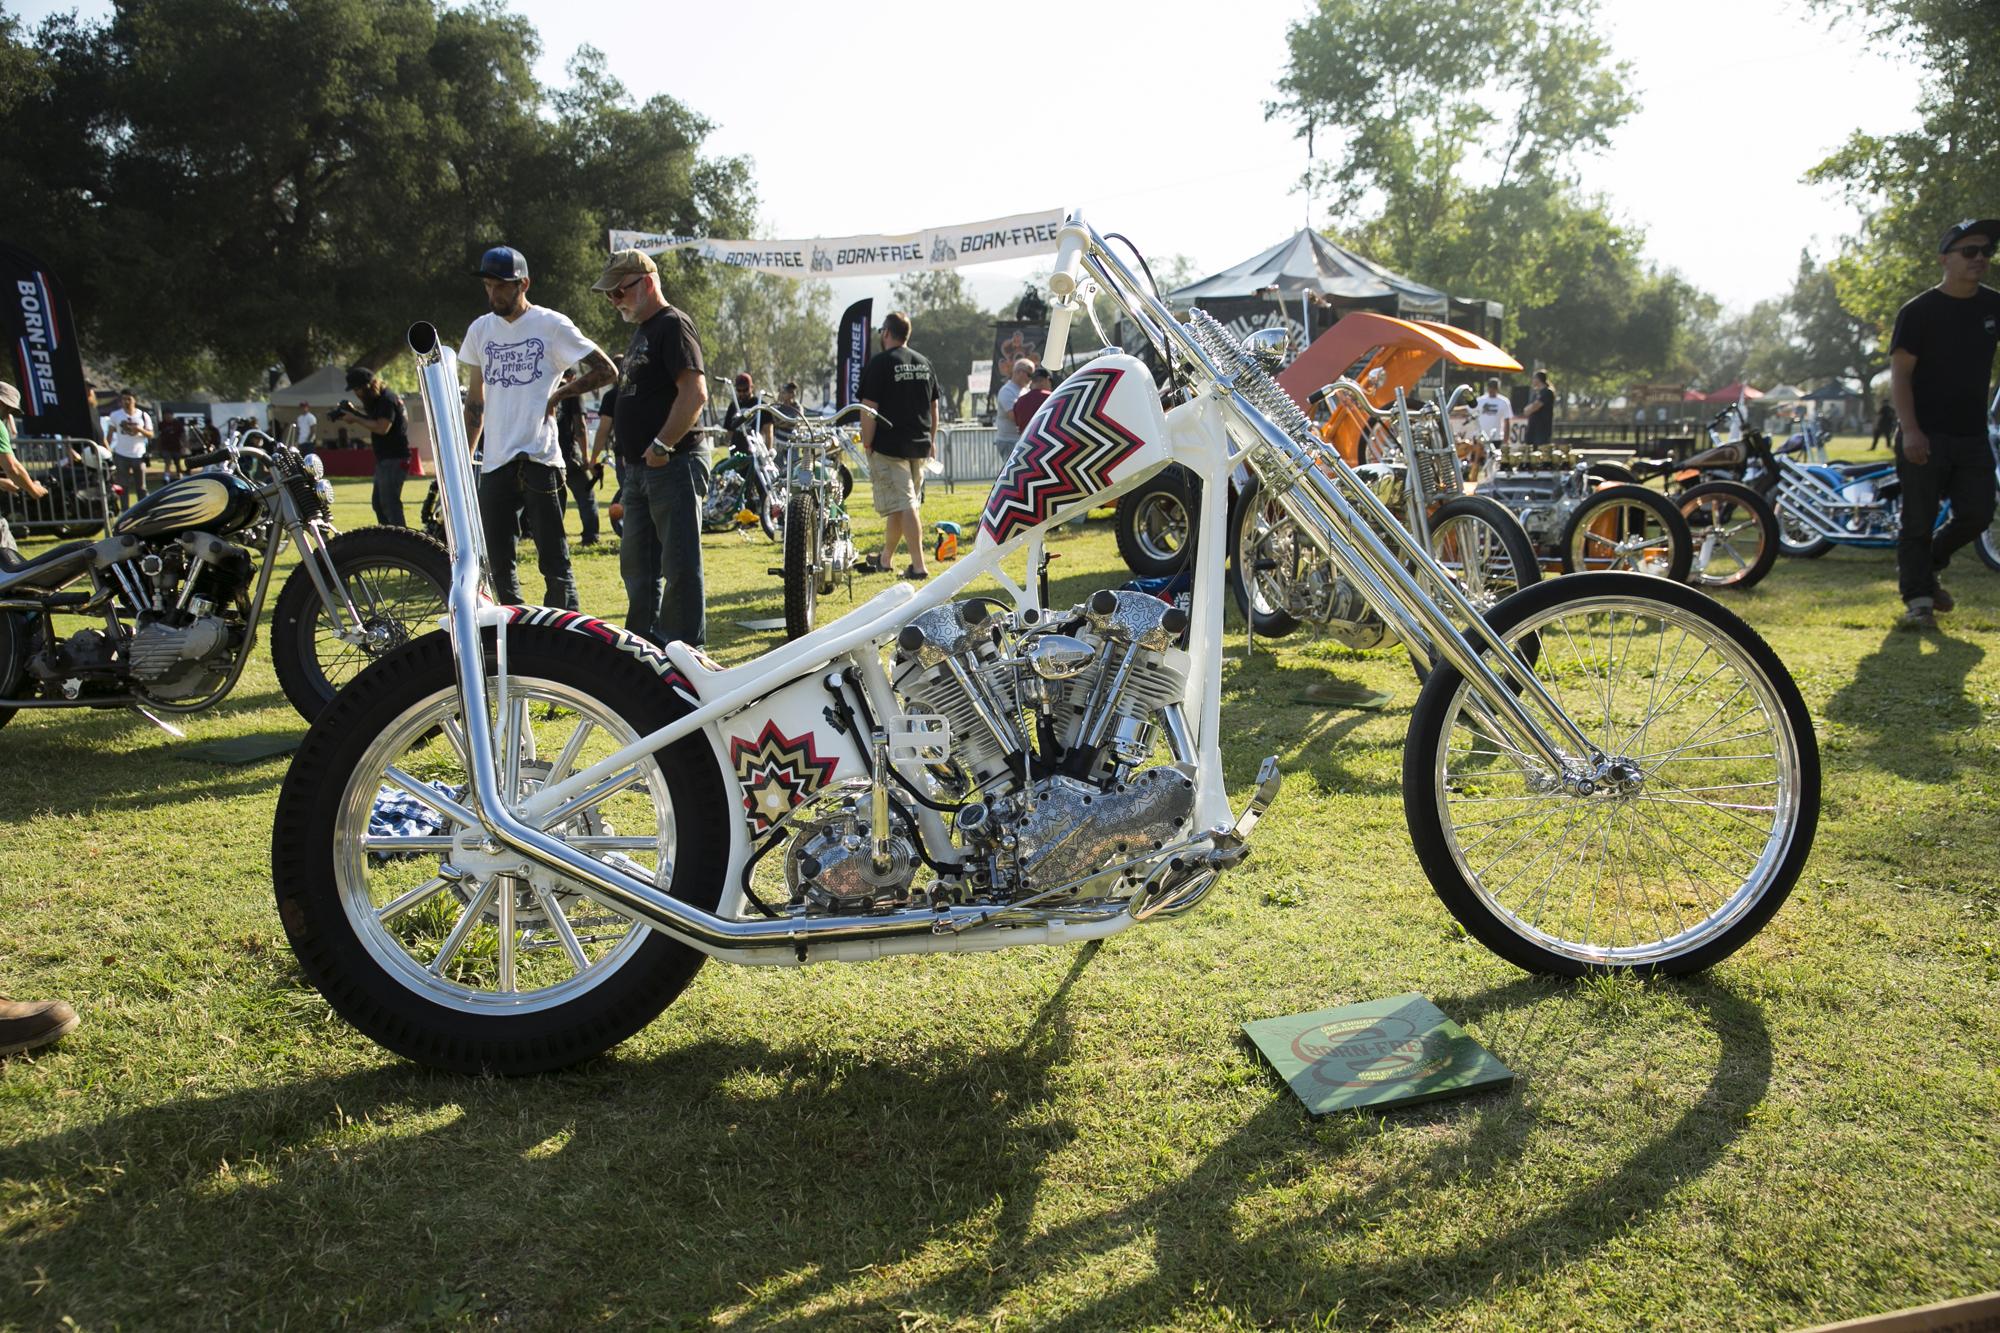 Born Free 8 Motorcycle Show-069.jpg